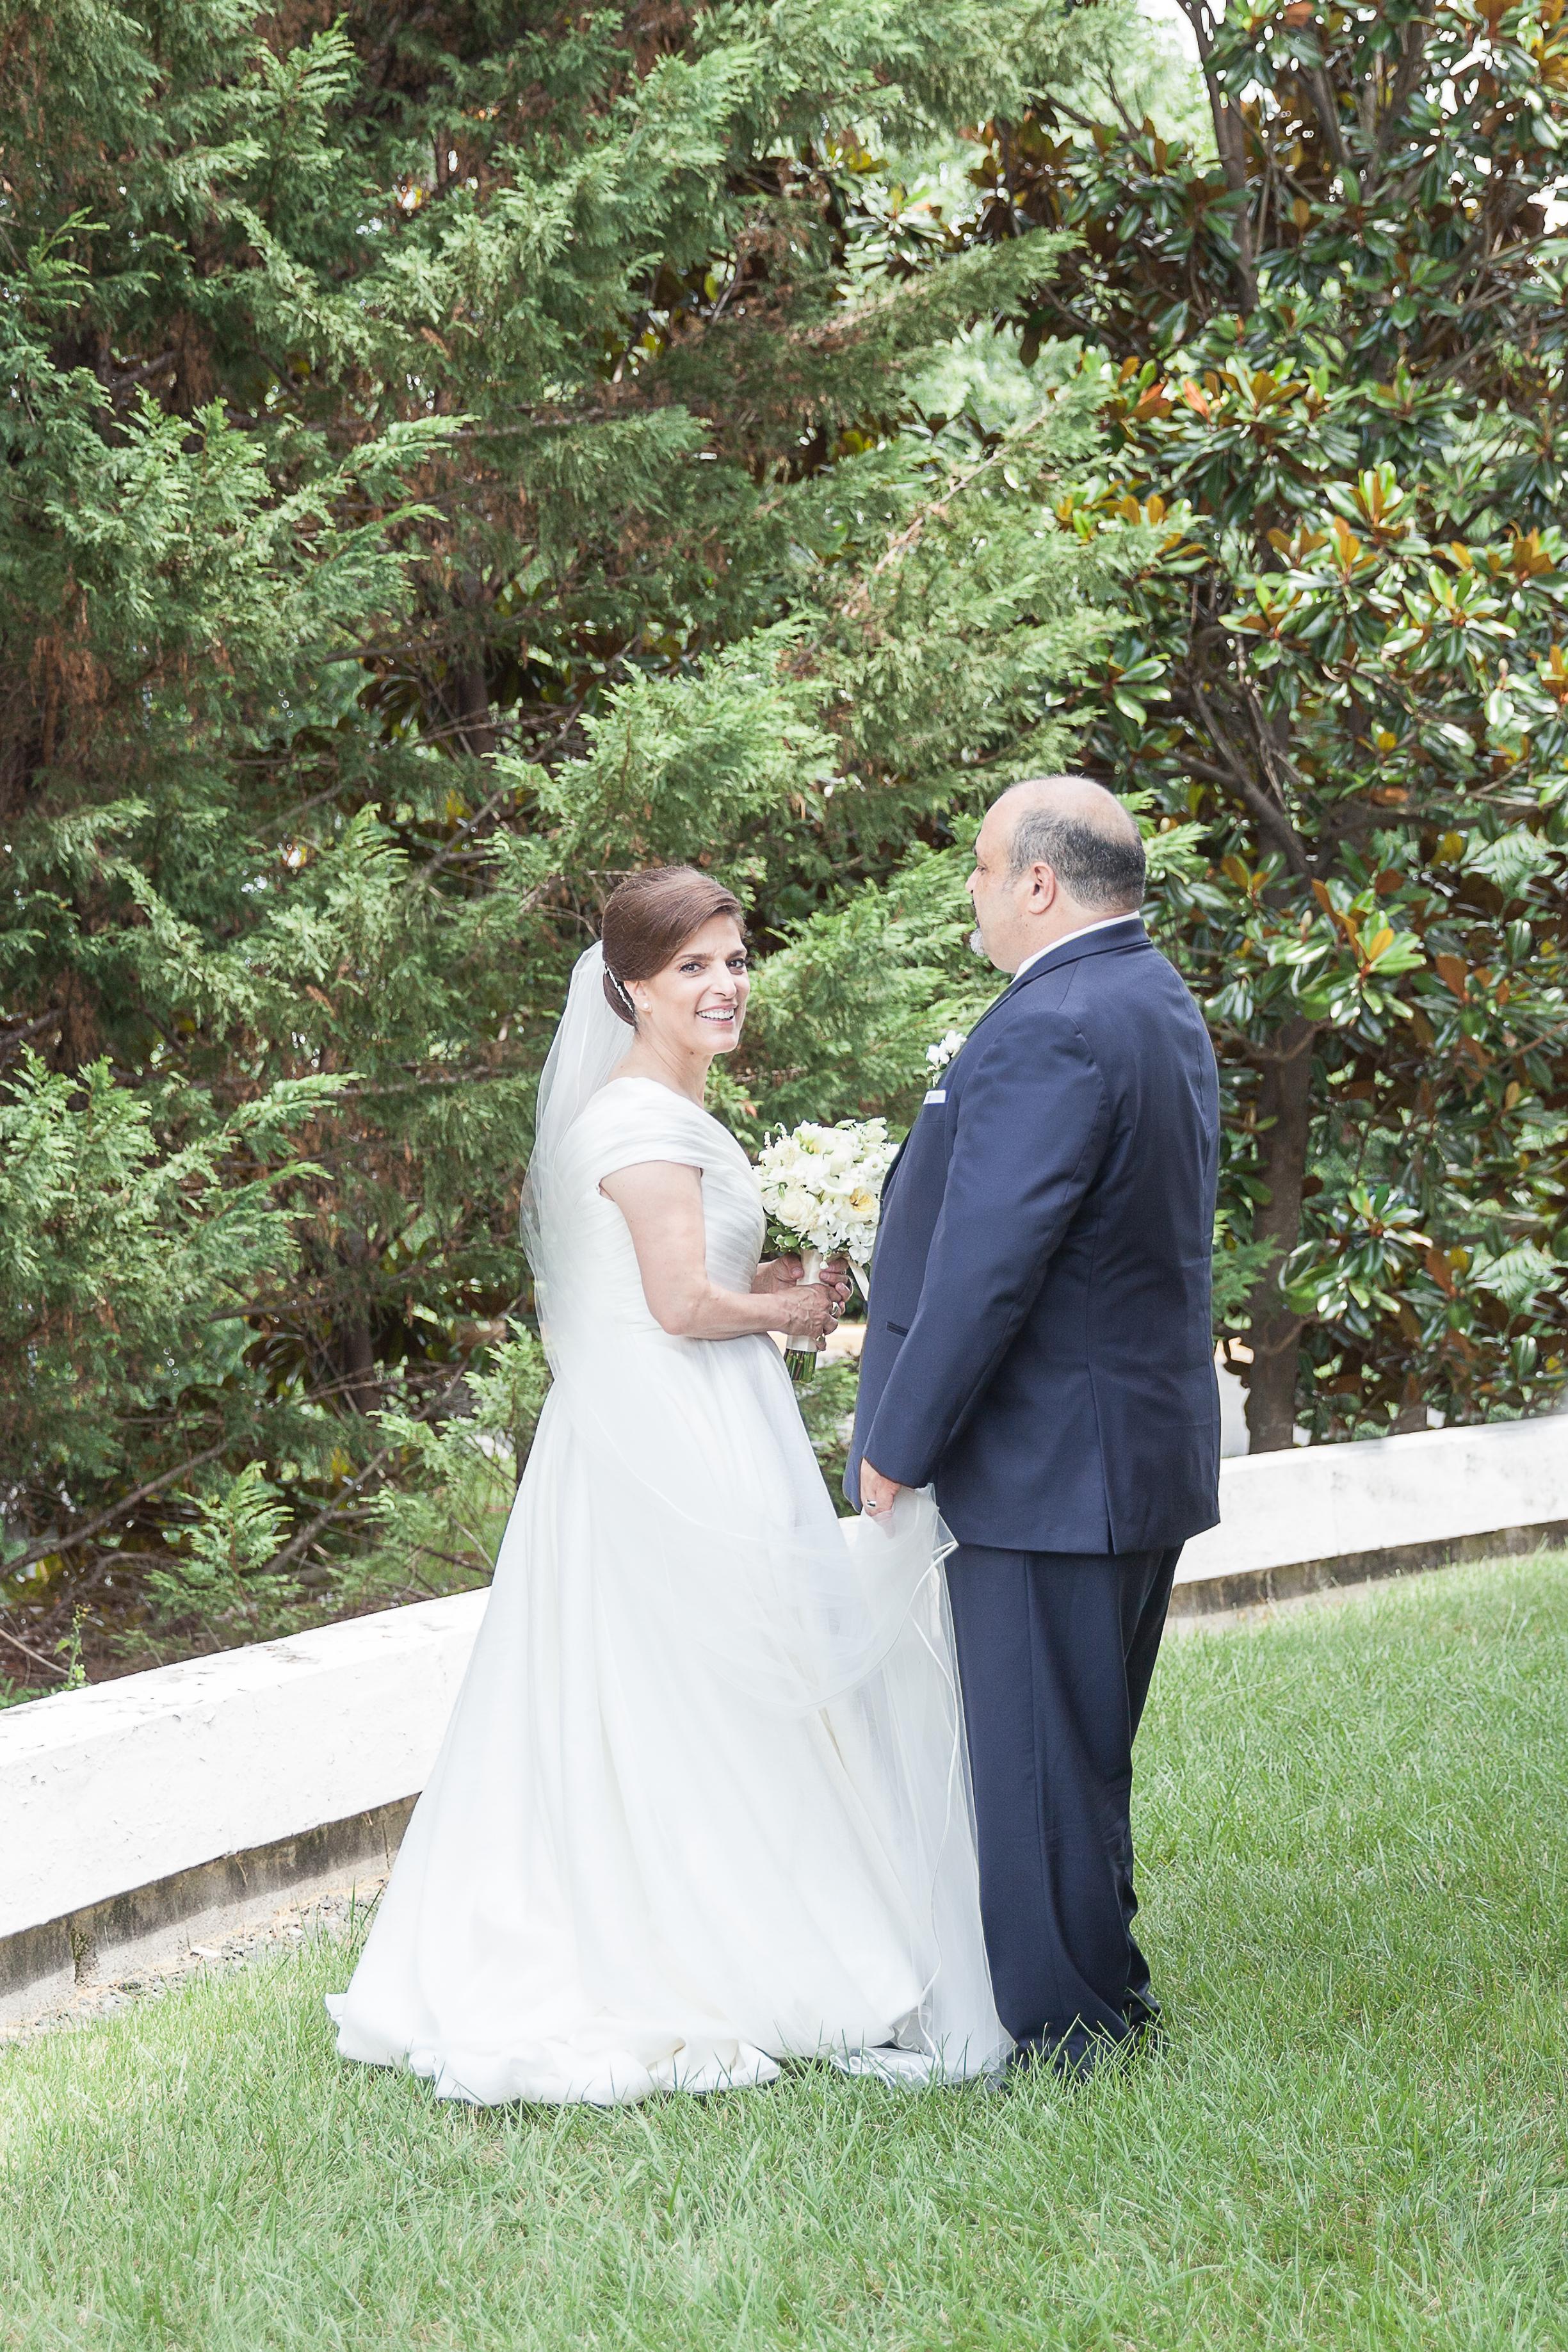 Tina-Paul-Wedding-Kim-Pham-Clark-Photography-10.jpg